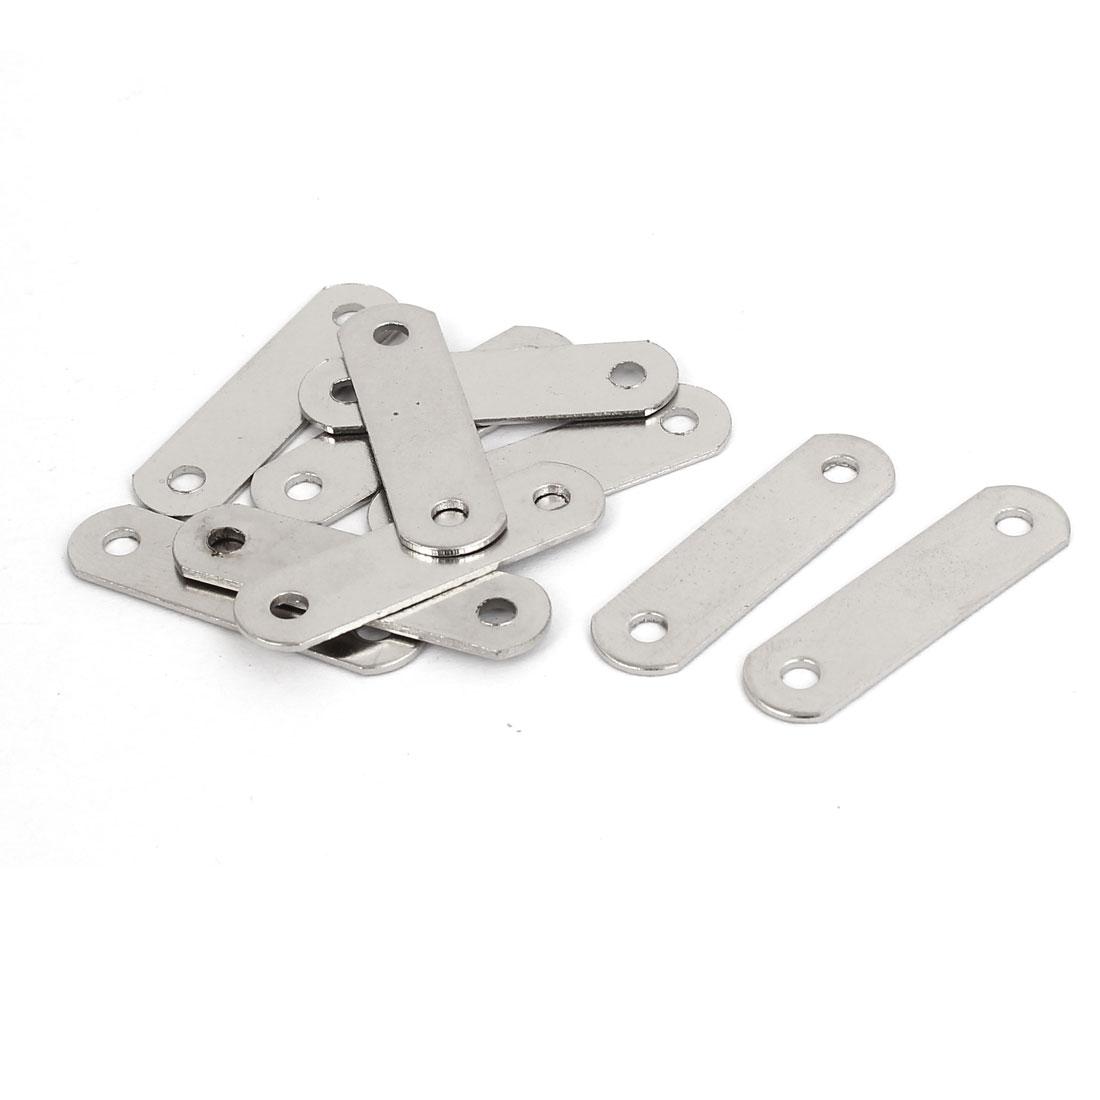 30mm x 8mm Straight Corner Fixing Brackets Flat Mending Repair Plates 10PCS